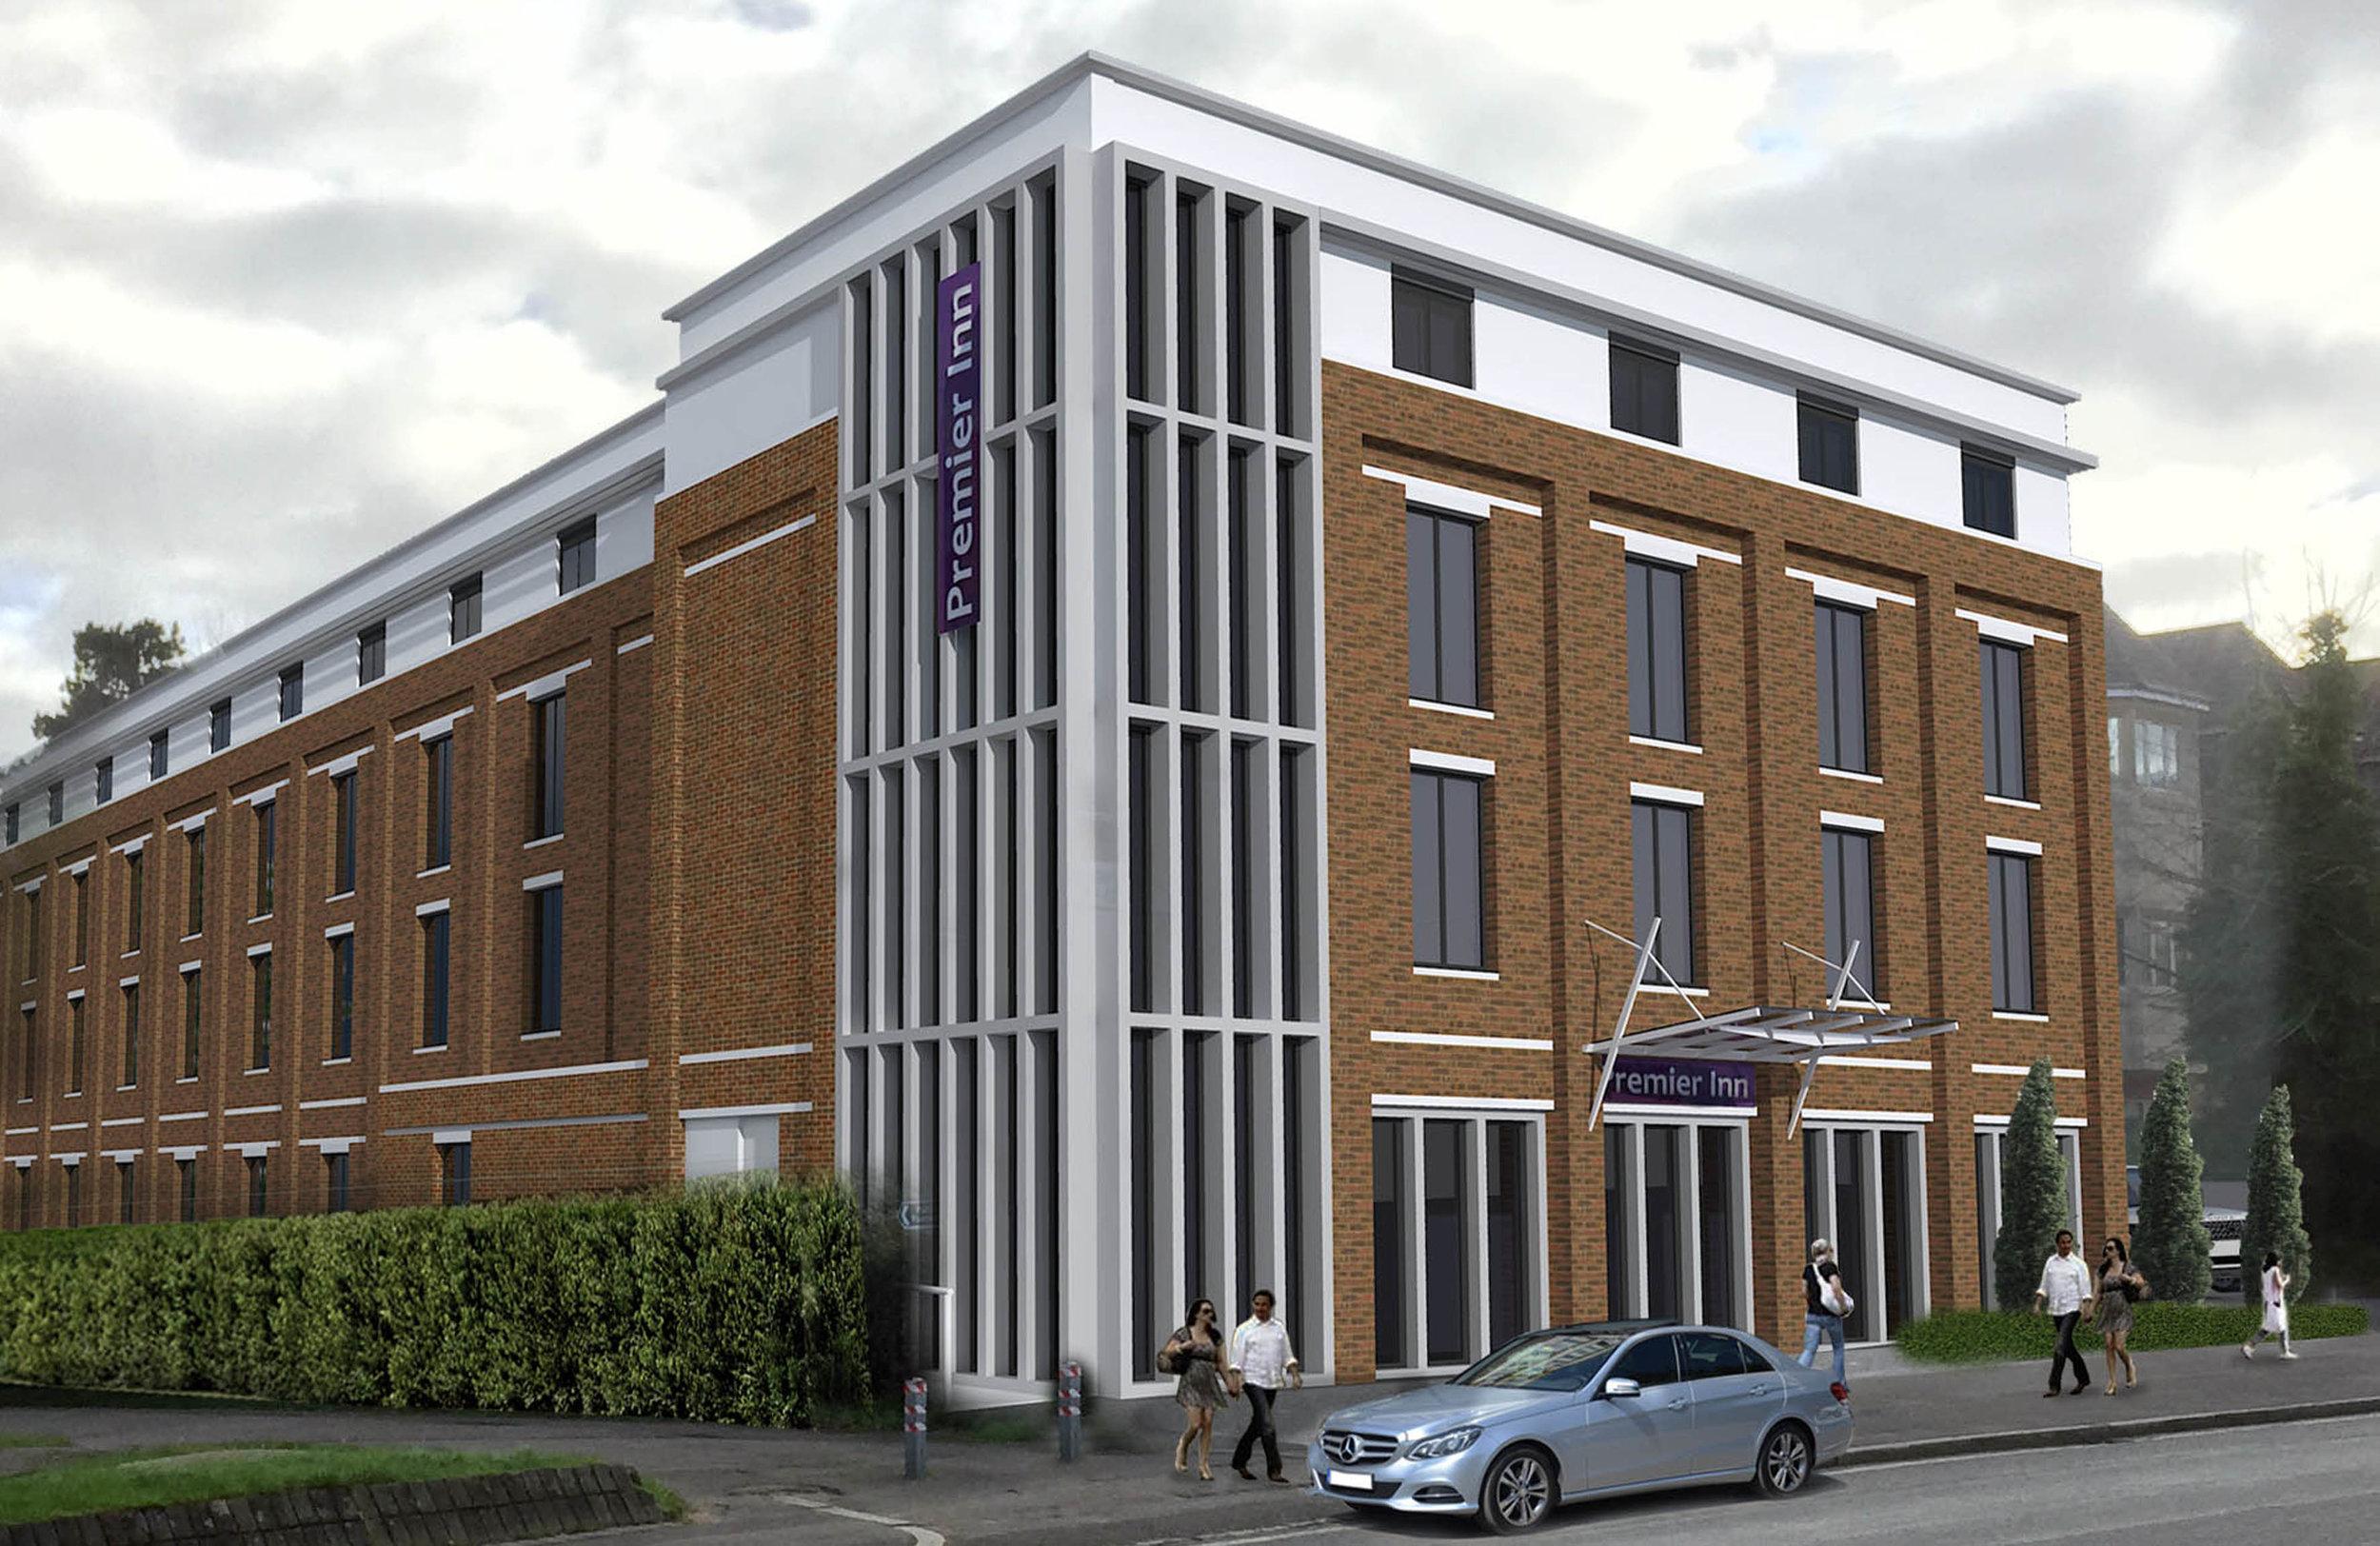 HOTEL - DEVELOPMENT - ACQUISITION    Premier Inn Hotel - Pre Let Forward Funding   78 Bed Hotel   Client:  Private Retained Client   Vendor/Developer:  Storm   Price:  Circa £9m